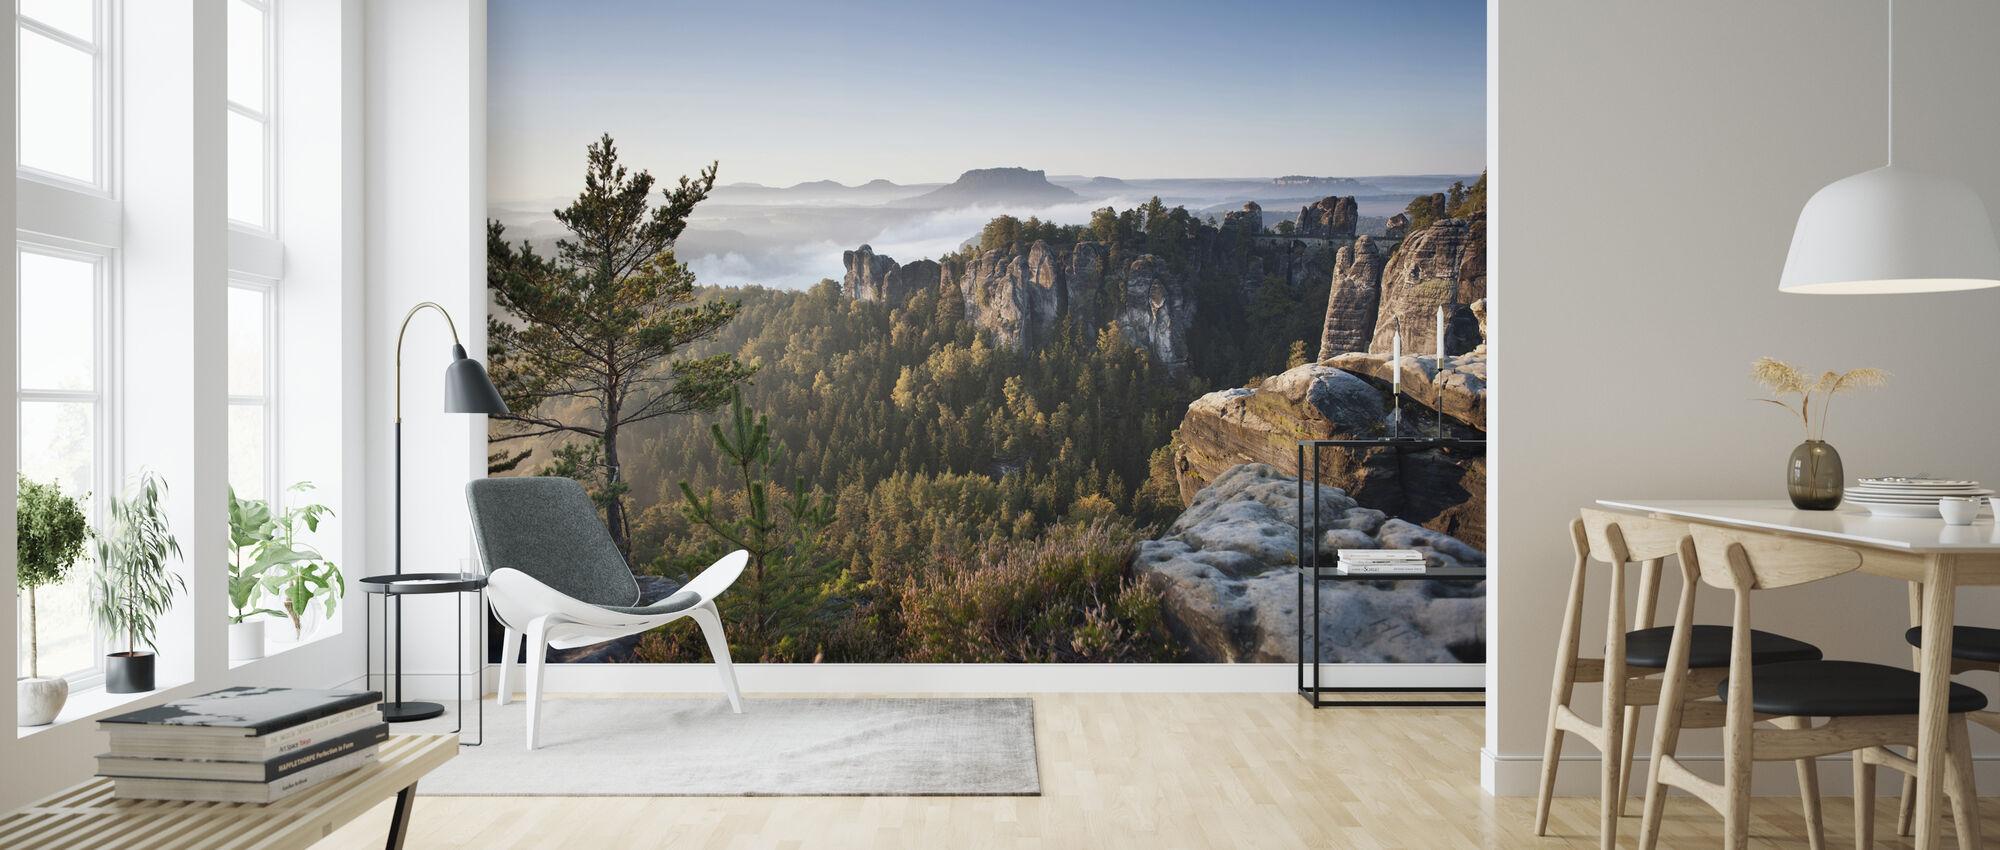 Morning at the Bastei - Wallpaper - Living Room